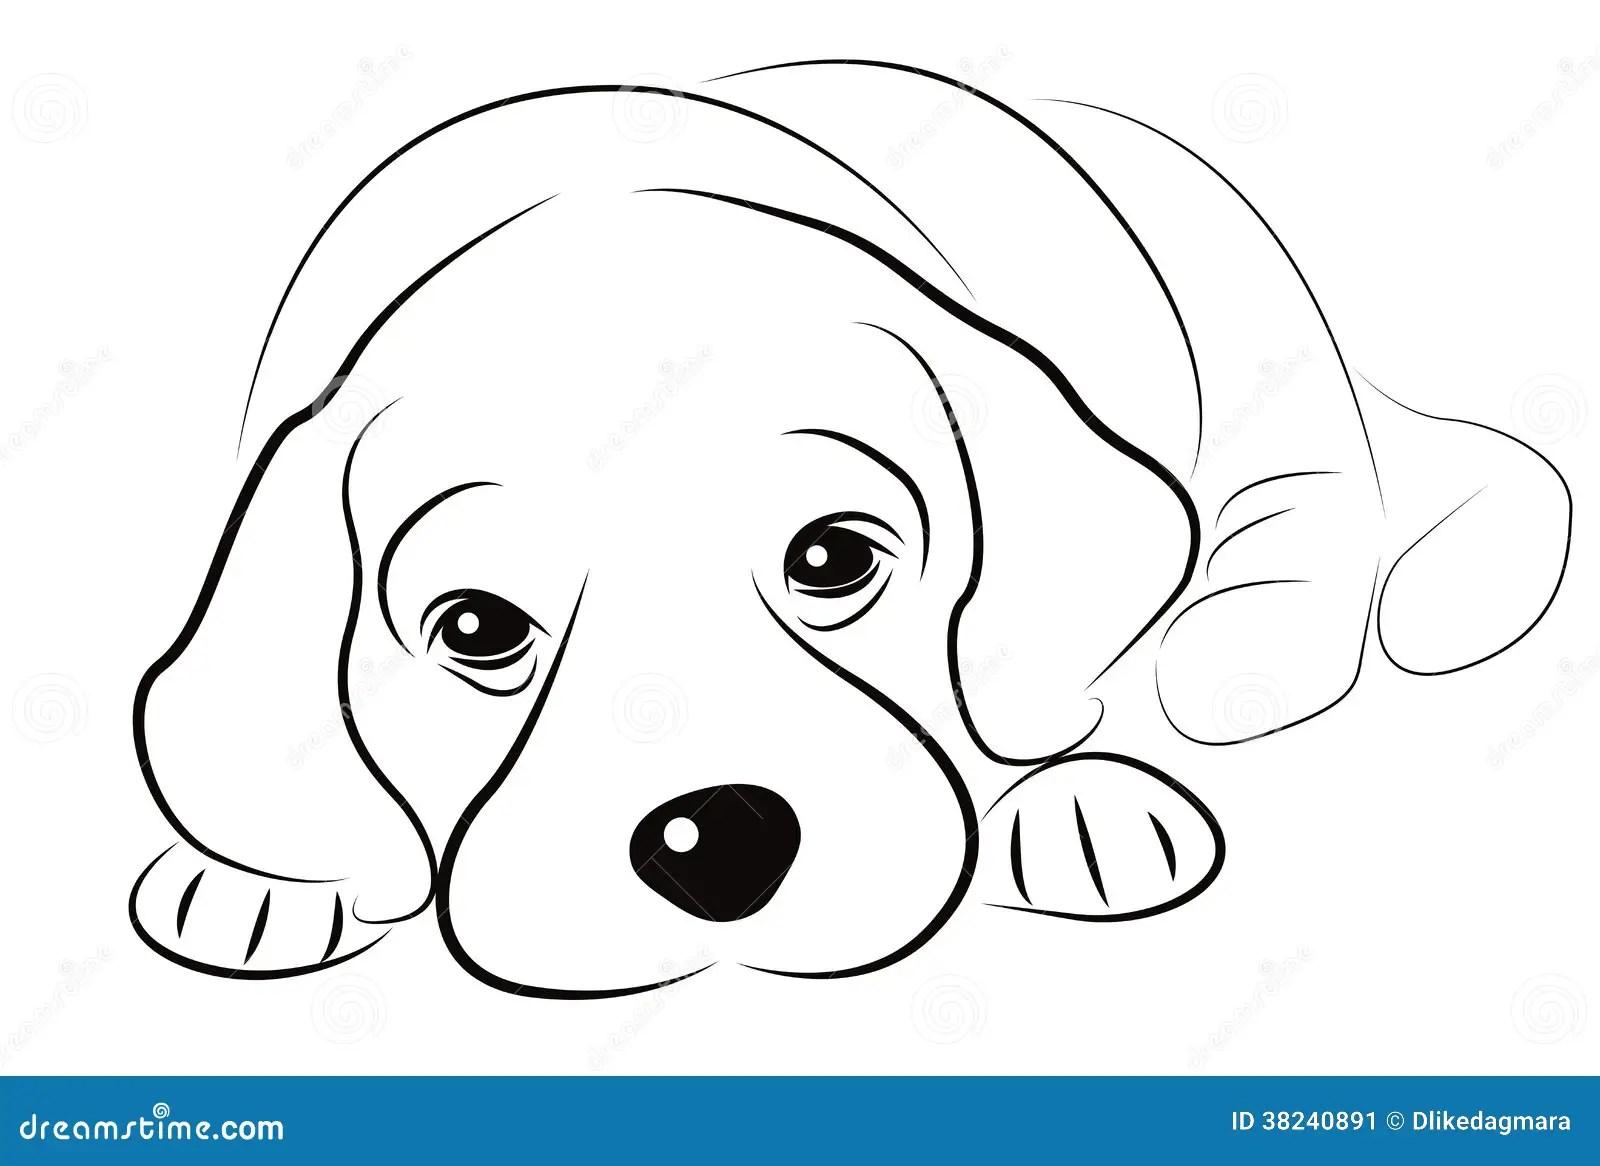 Puppy Sketch Stock Illustration Illustration Of Sketch